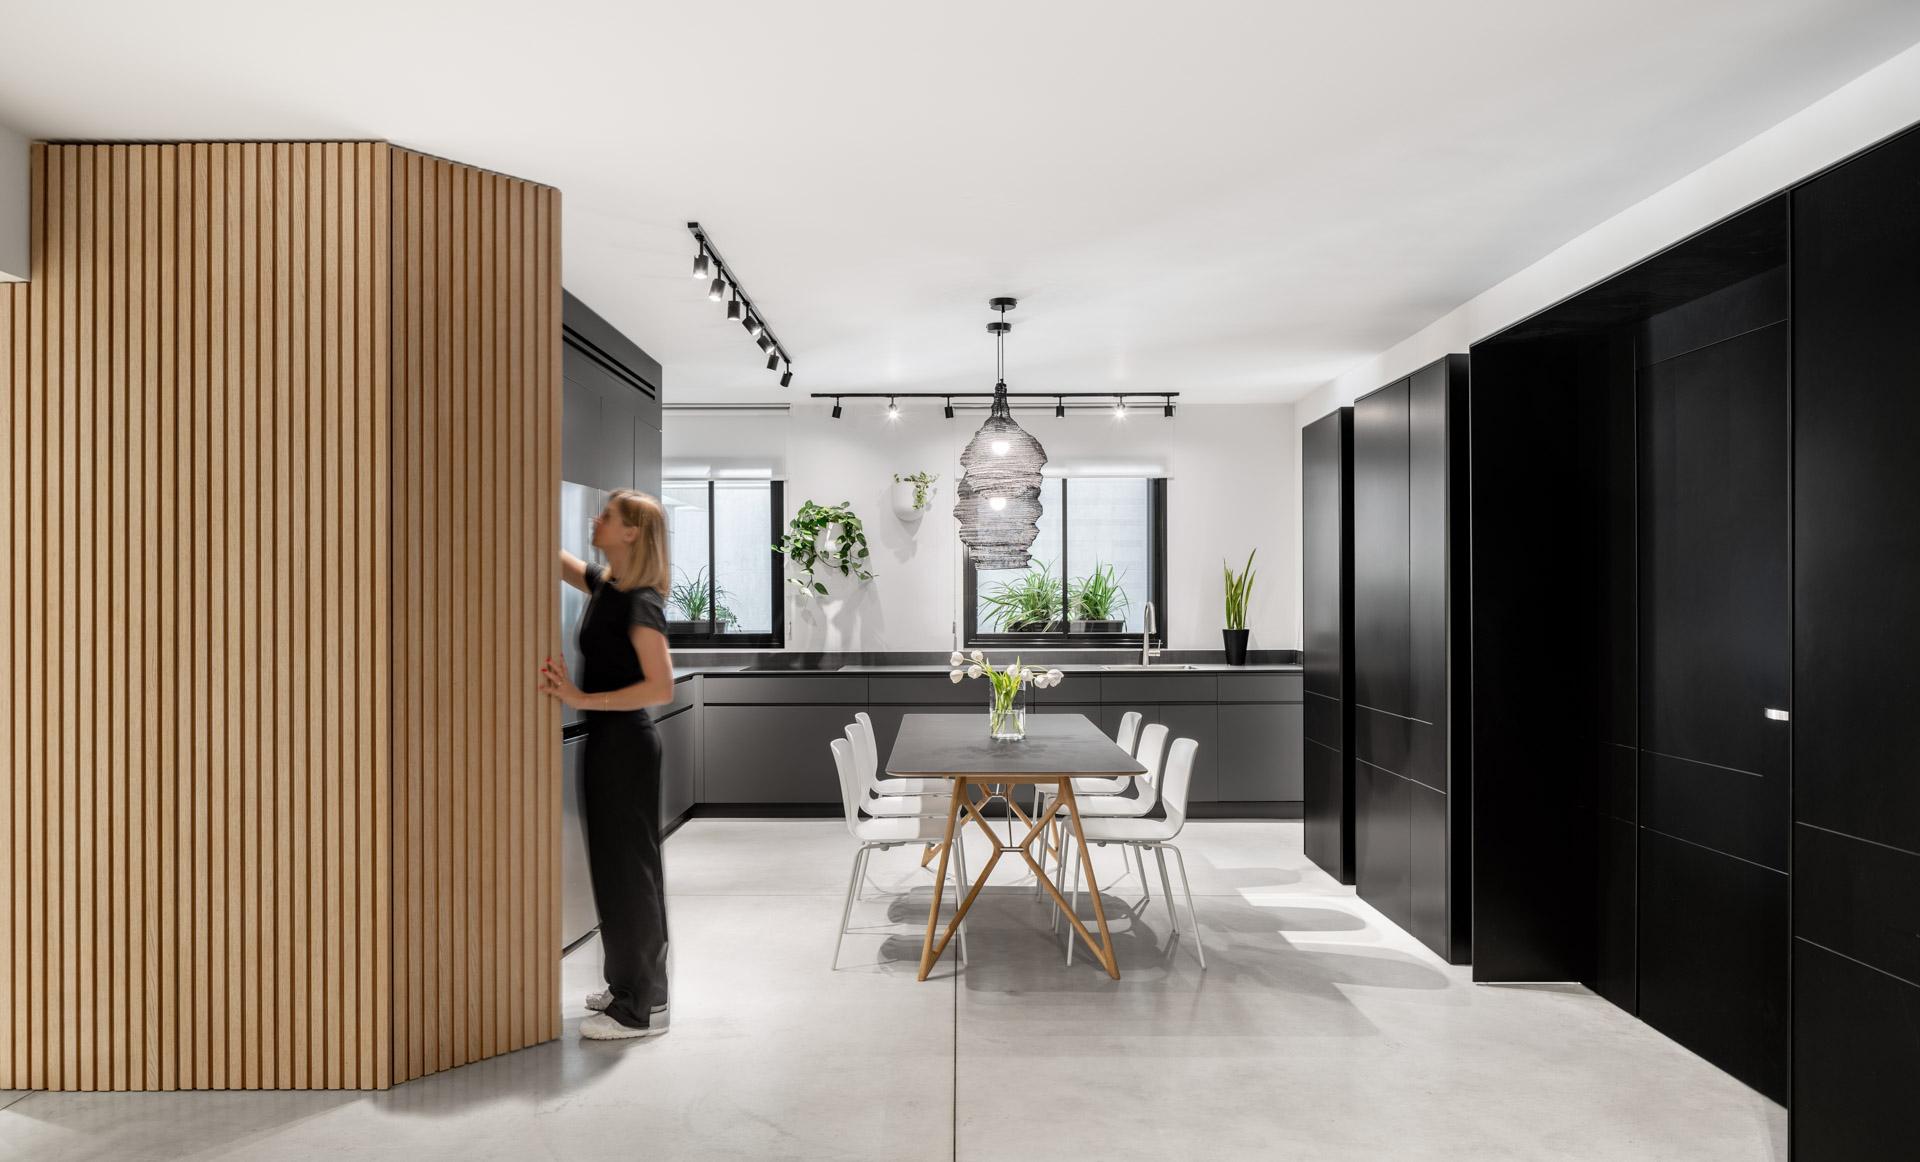 Peled-Studios-Two-Apartments_-33-HDR-copy-1